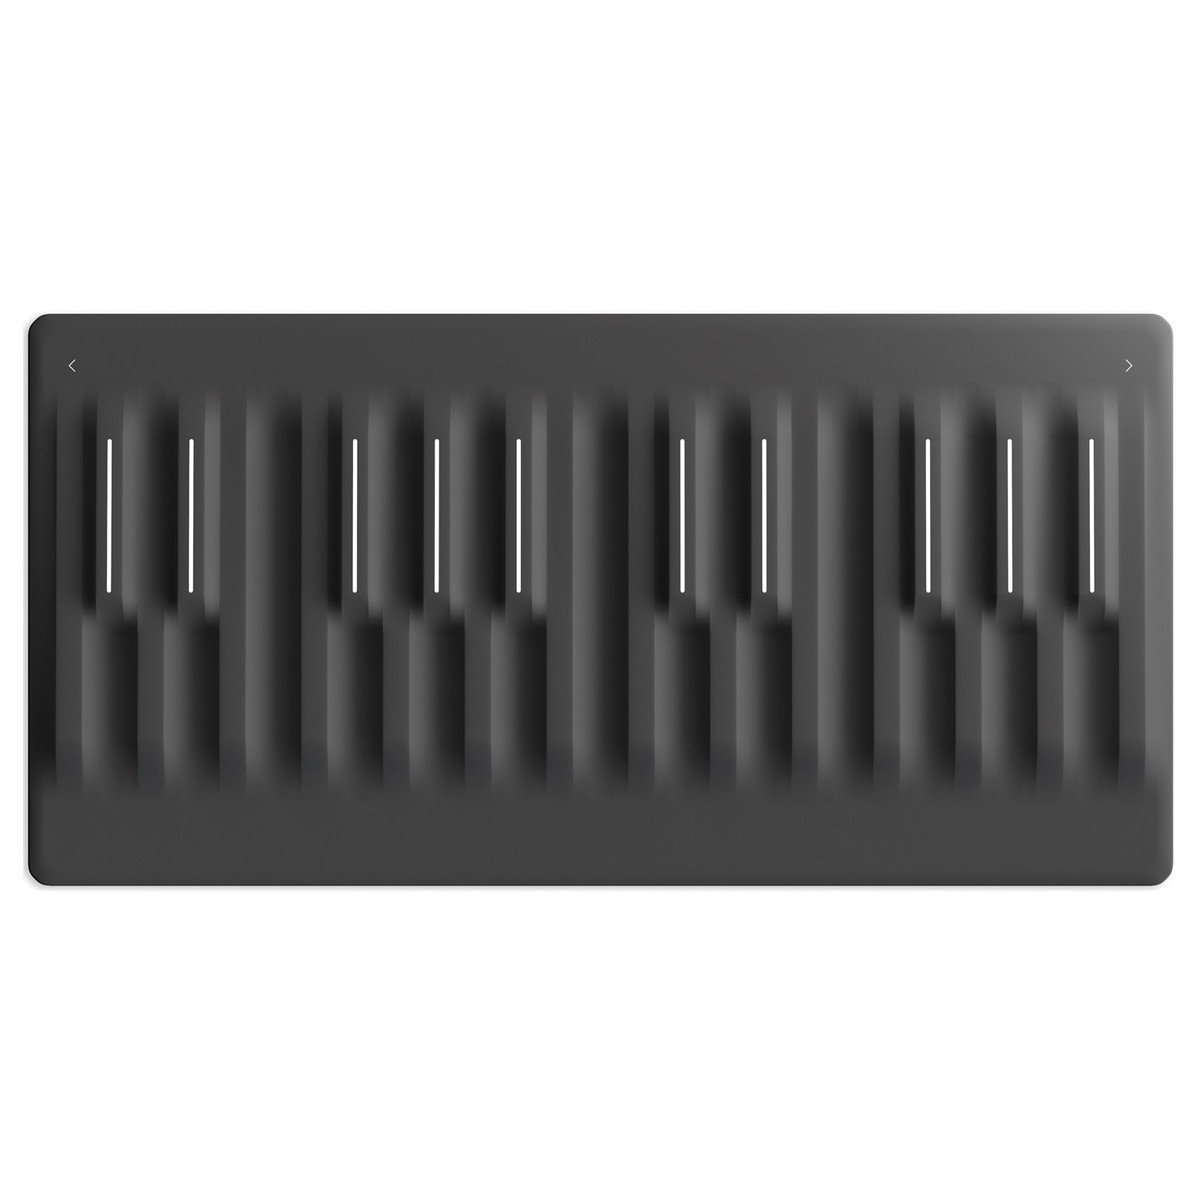 Roli Seaboard Block 5d-touch ausdrucksstarke Midi Controller